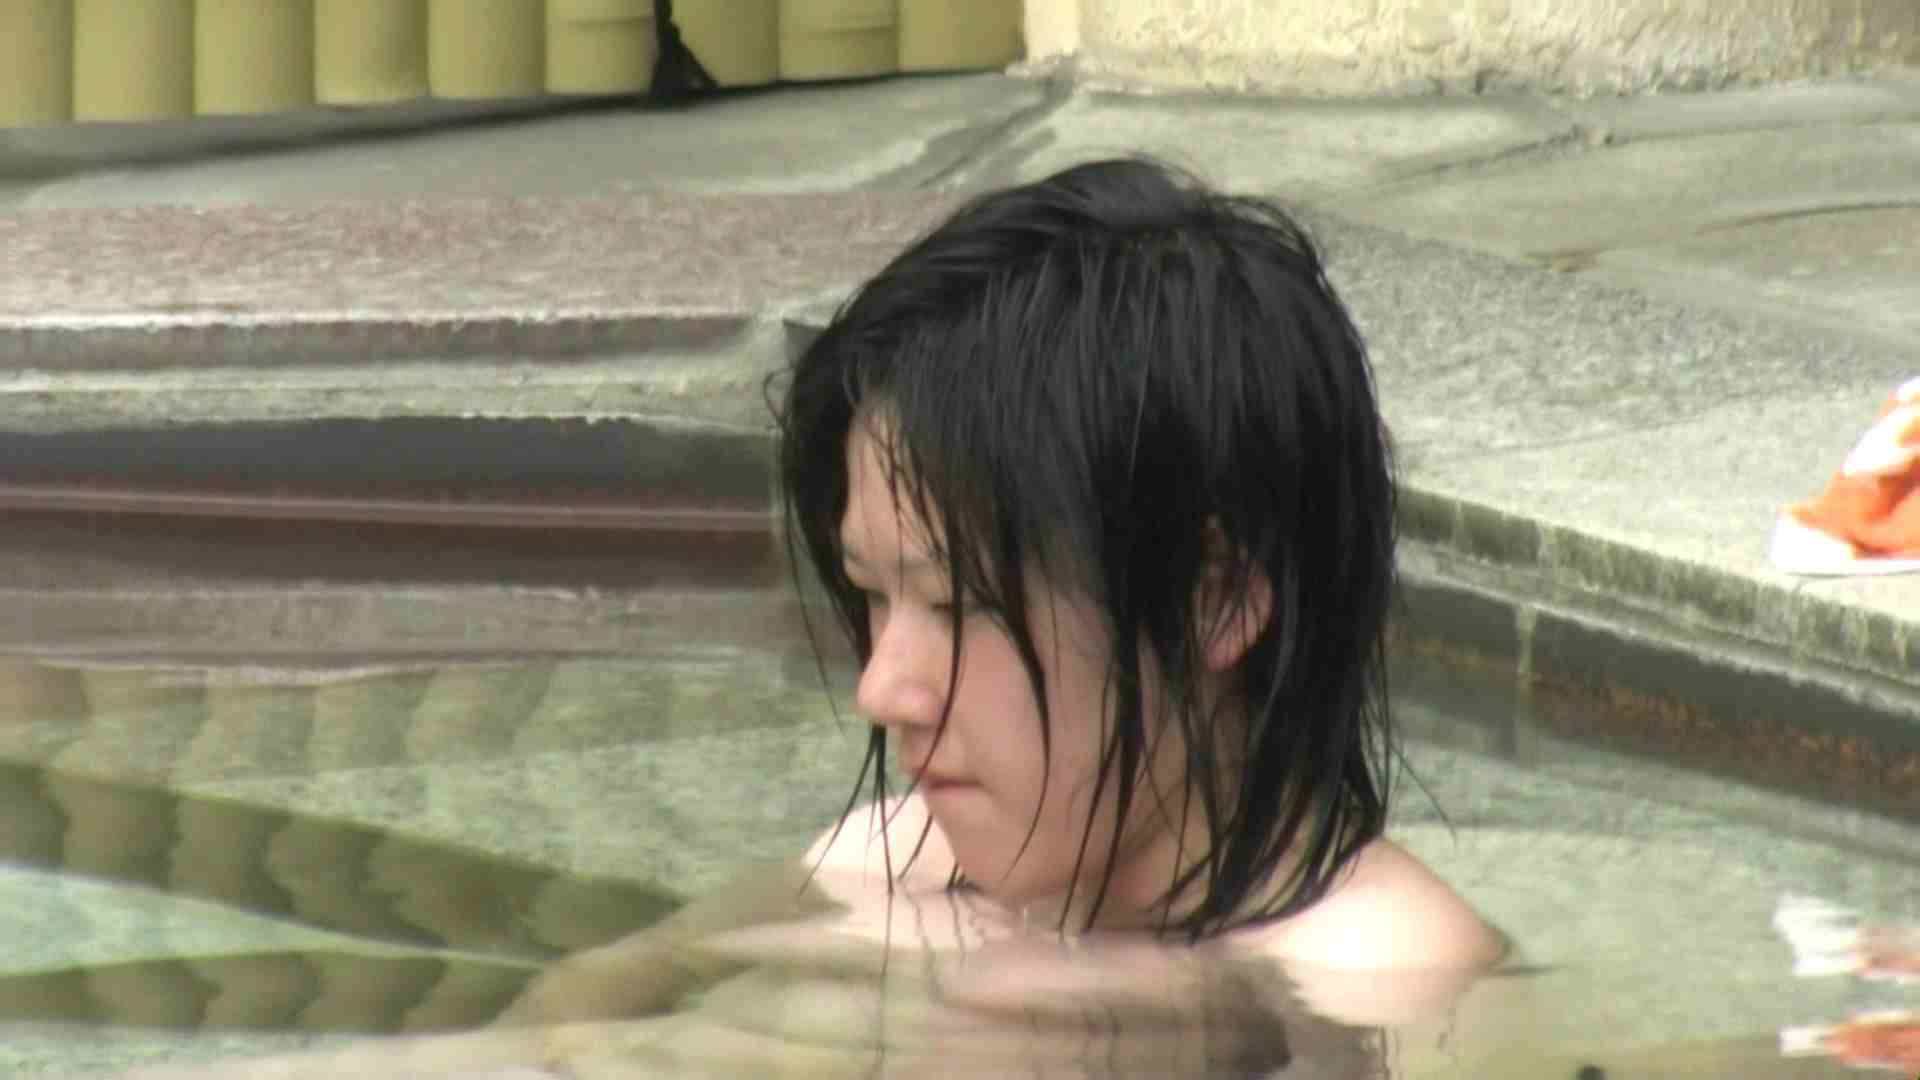 Aquaな露天風呂Vol.36 OL女体  78連発 39